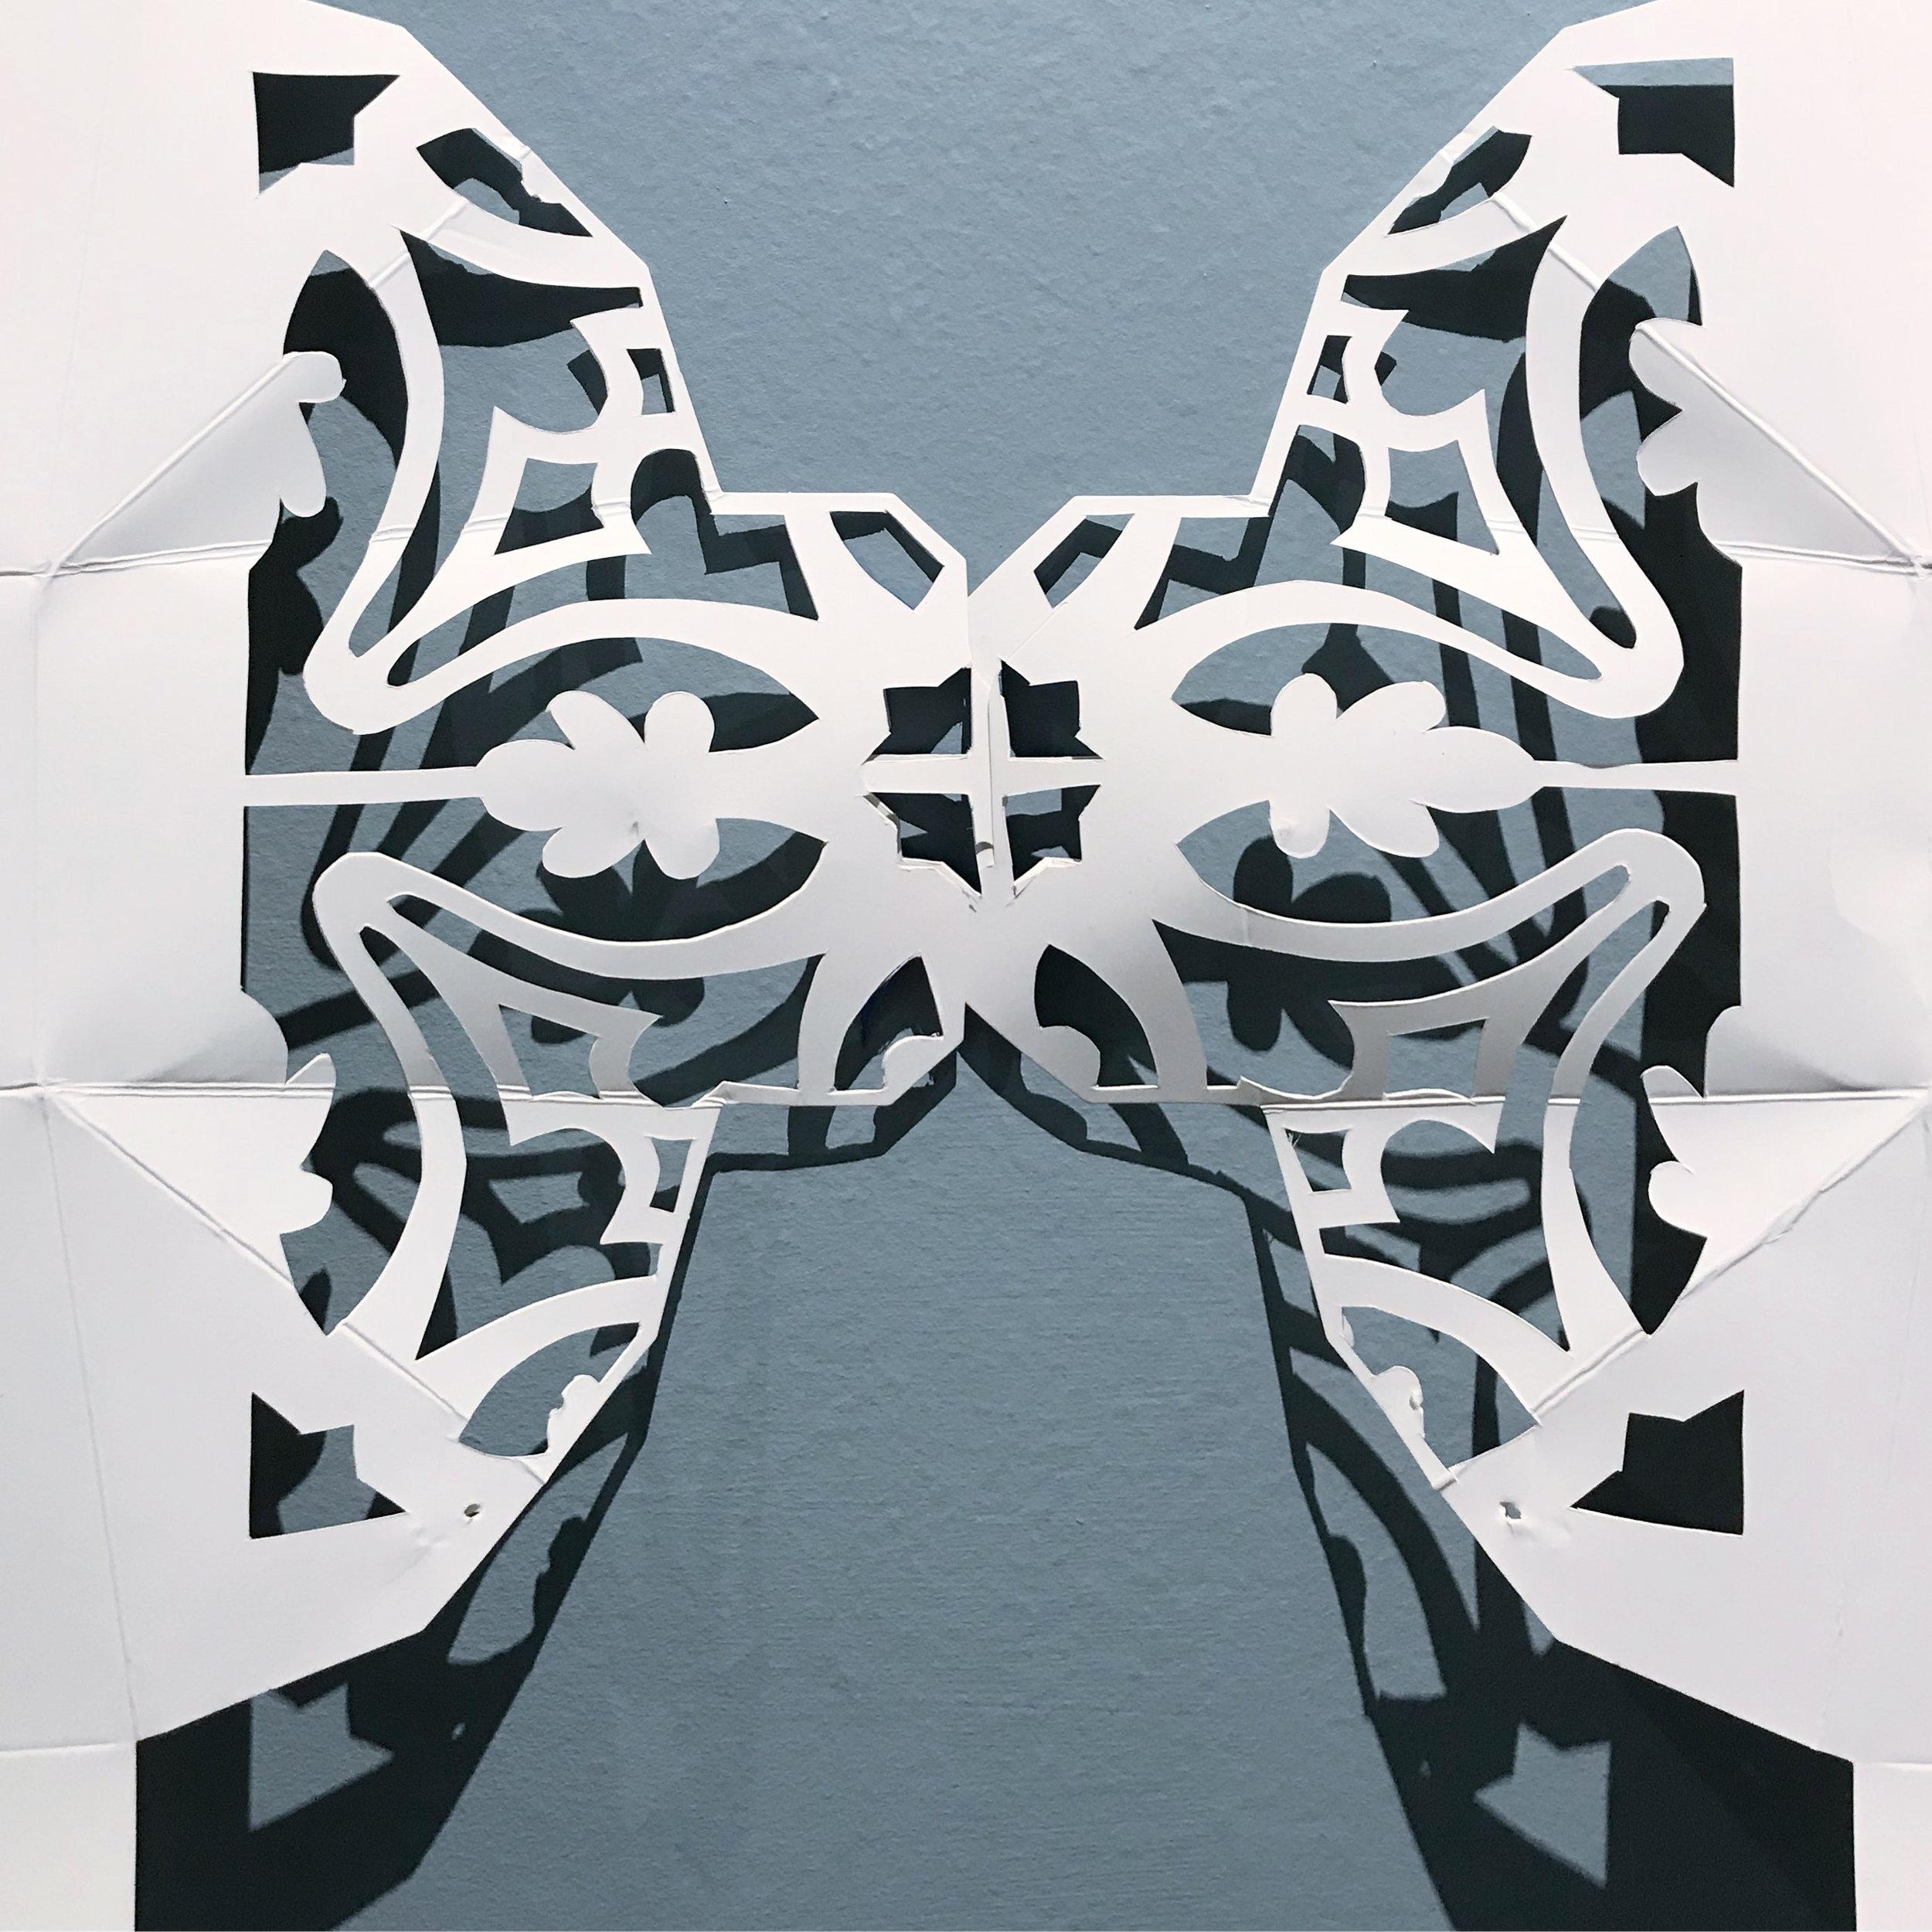 Take Away (Double Mariposa), Detail